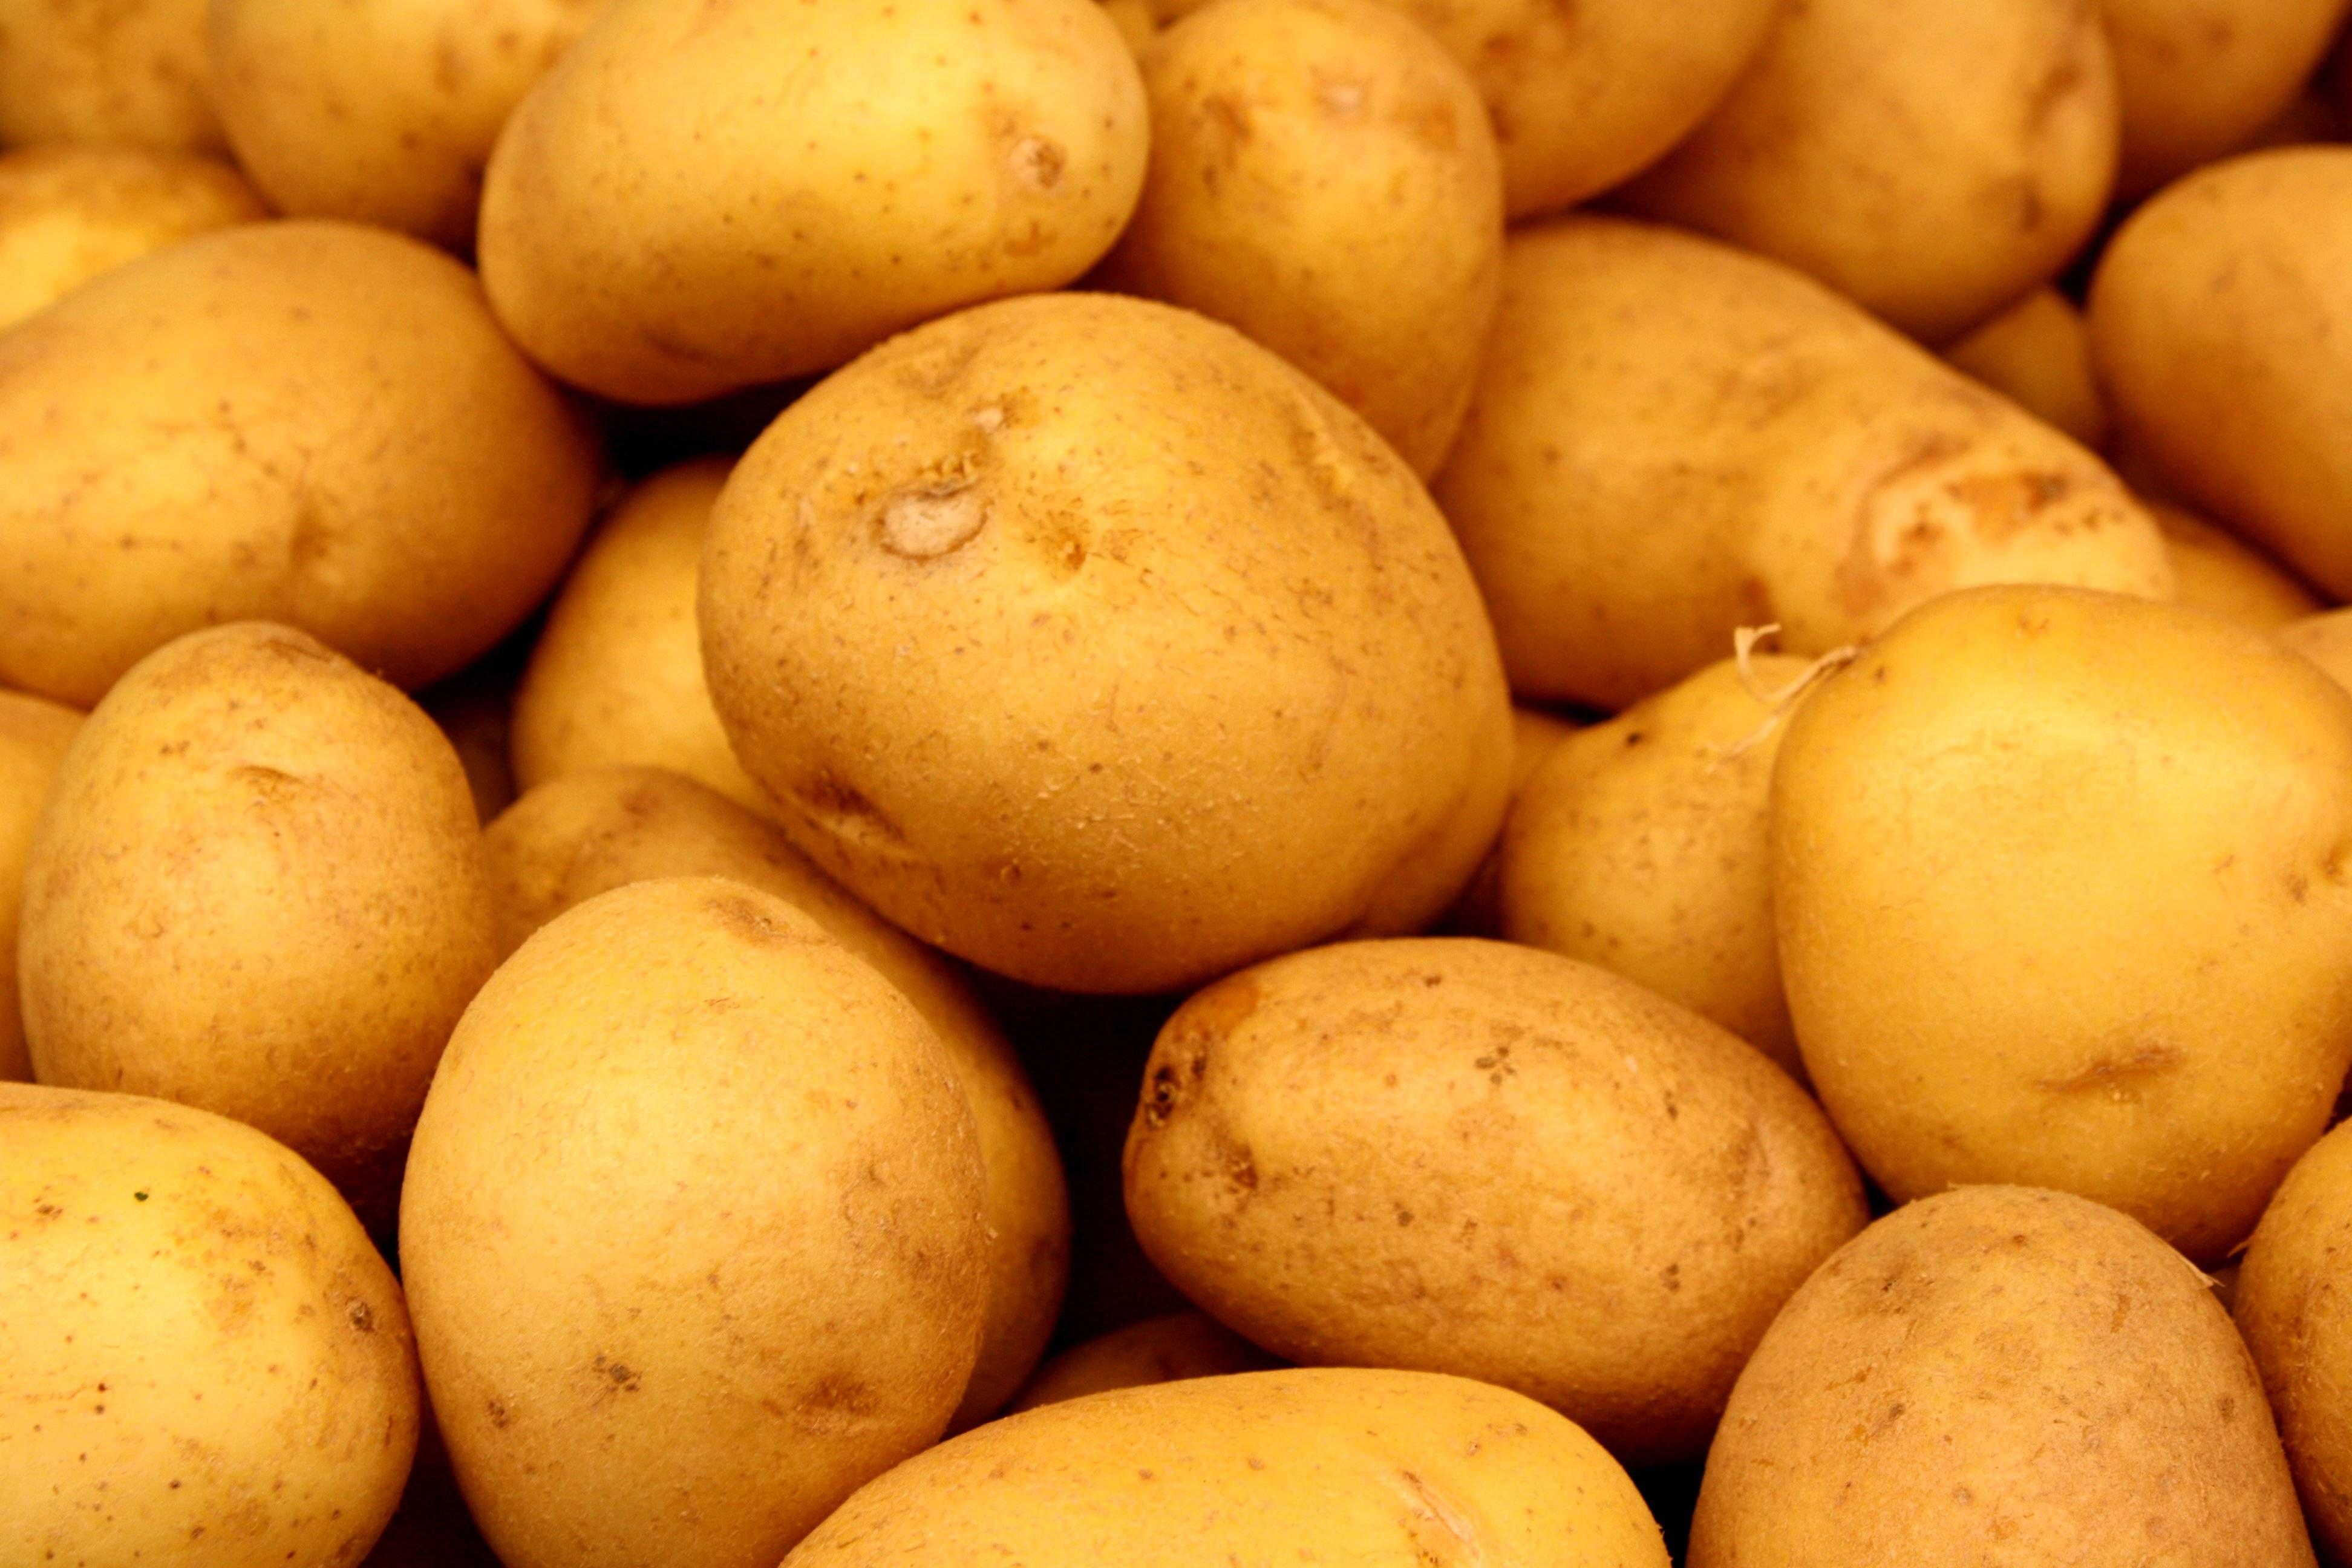 Potato Hd Wallpapers Potatoes Gmo Foods Sustainable Food